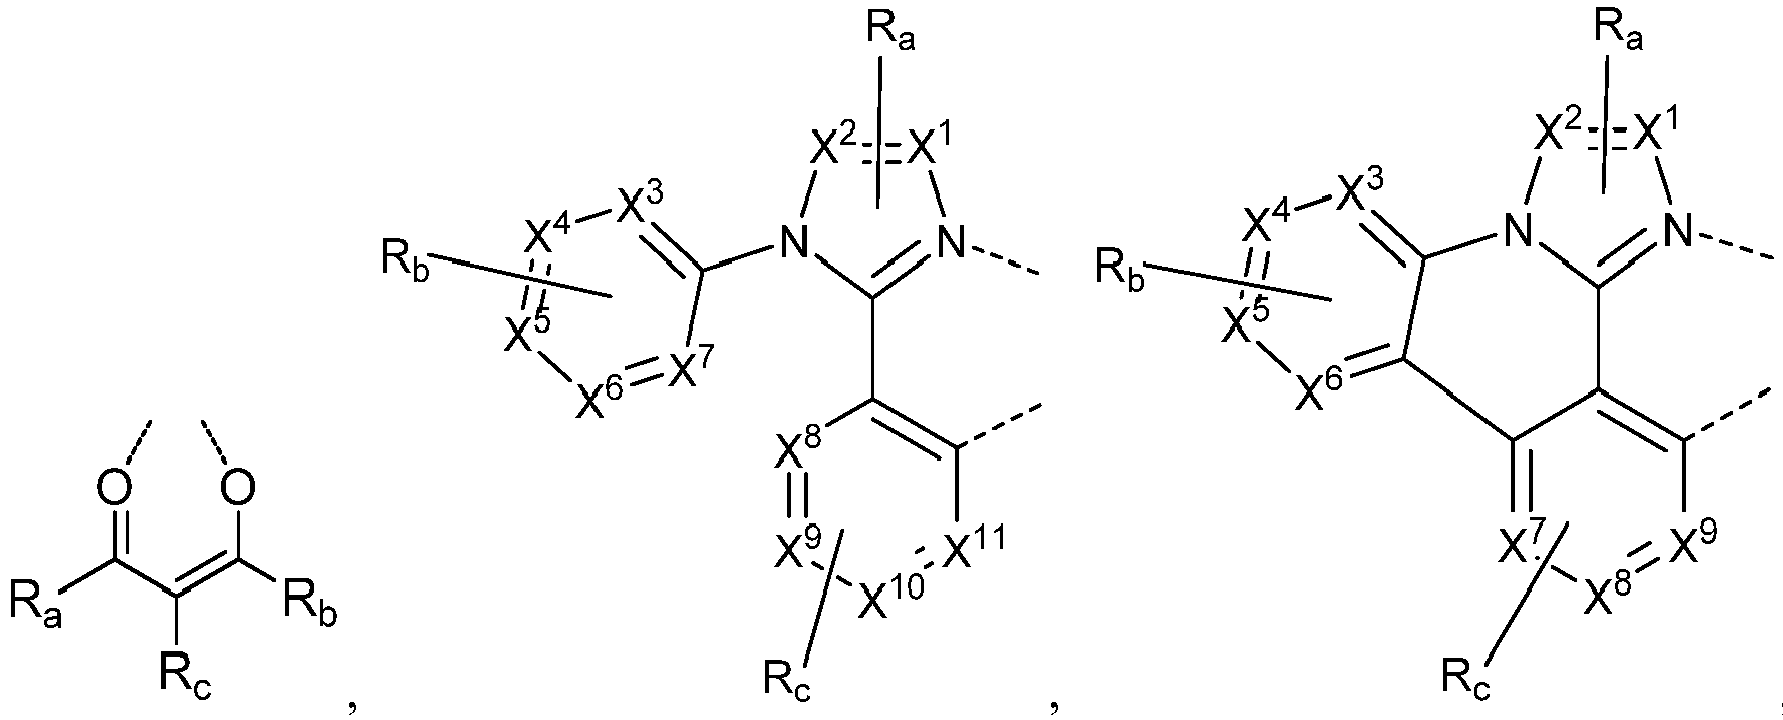 Figure imgb0973